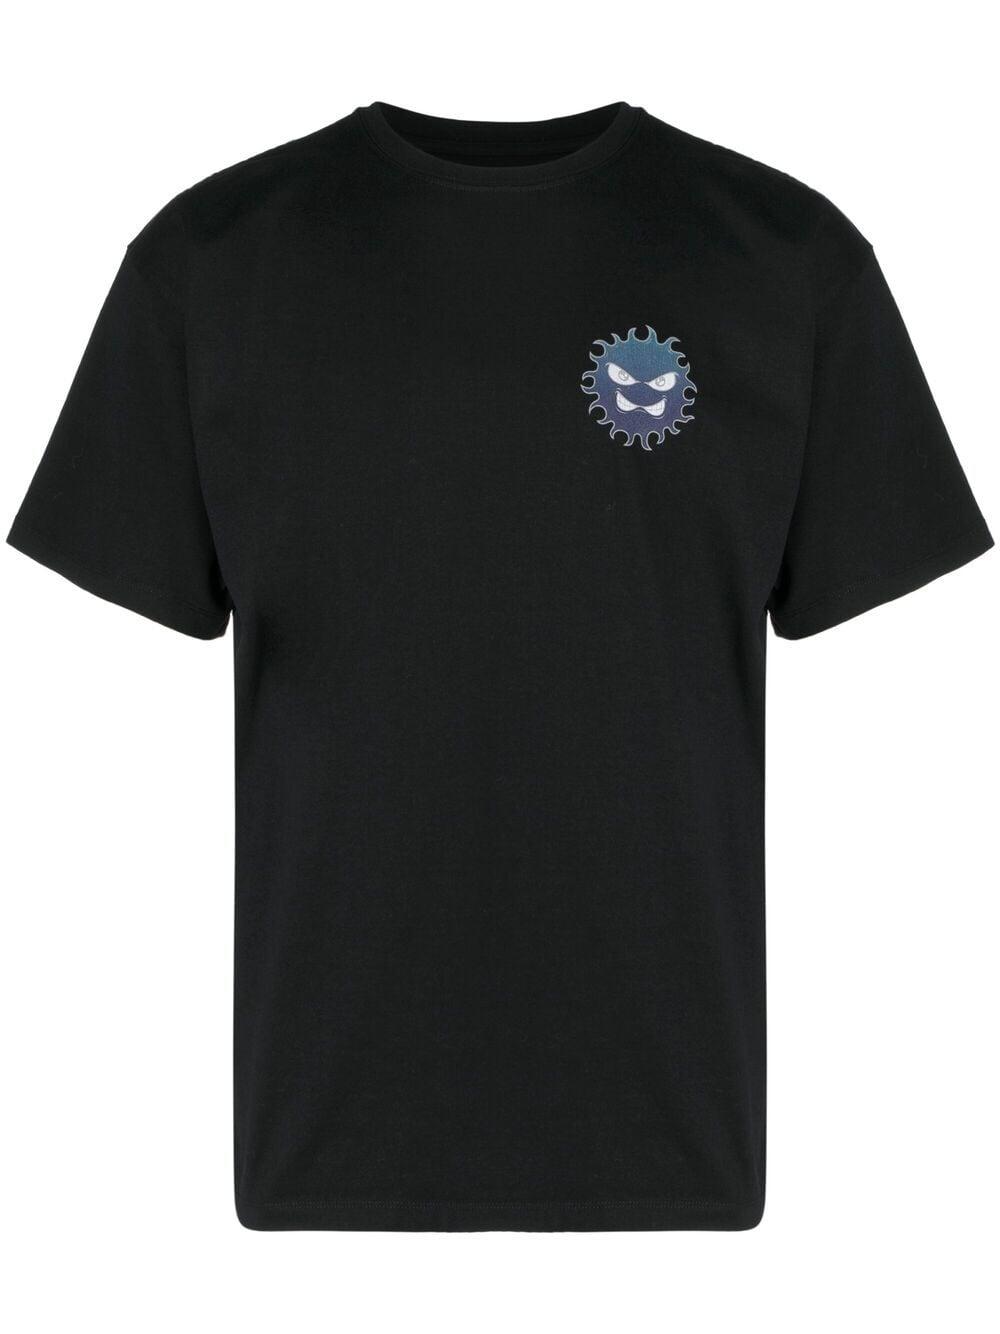 Rassvet t-shirt con stampa uomo RASSVET | T-shirt | PACC8T006BLACK